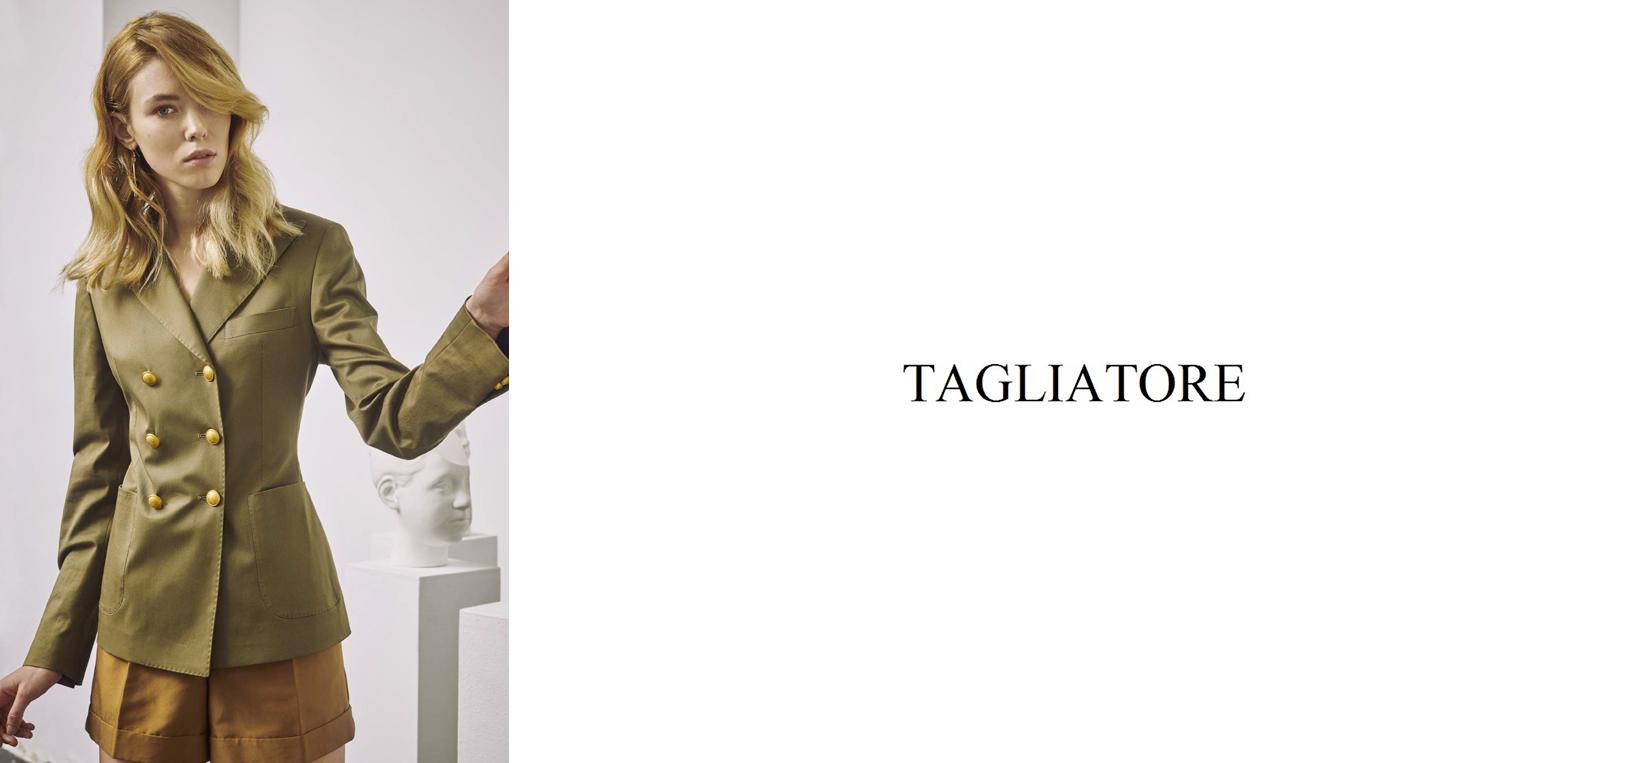 TAGLIATORE - Women - Clothing - JACKETS - Leam Roma